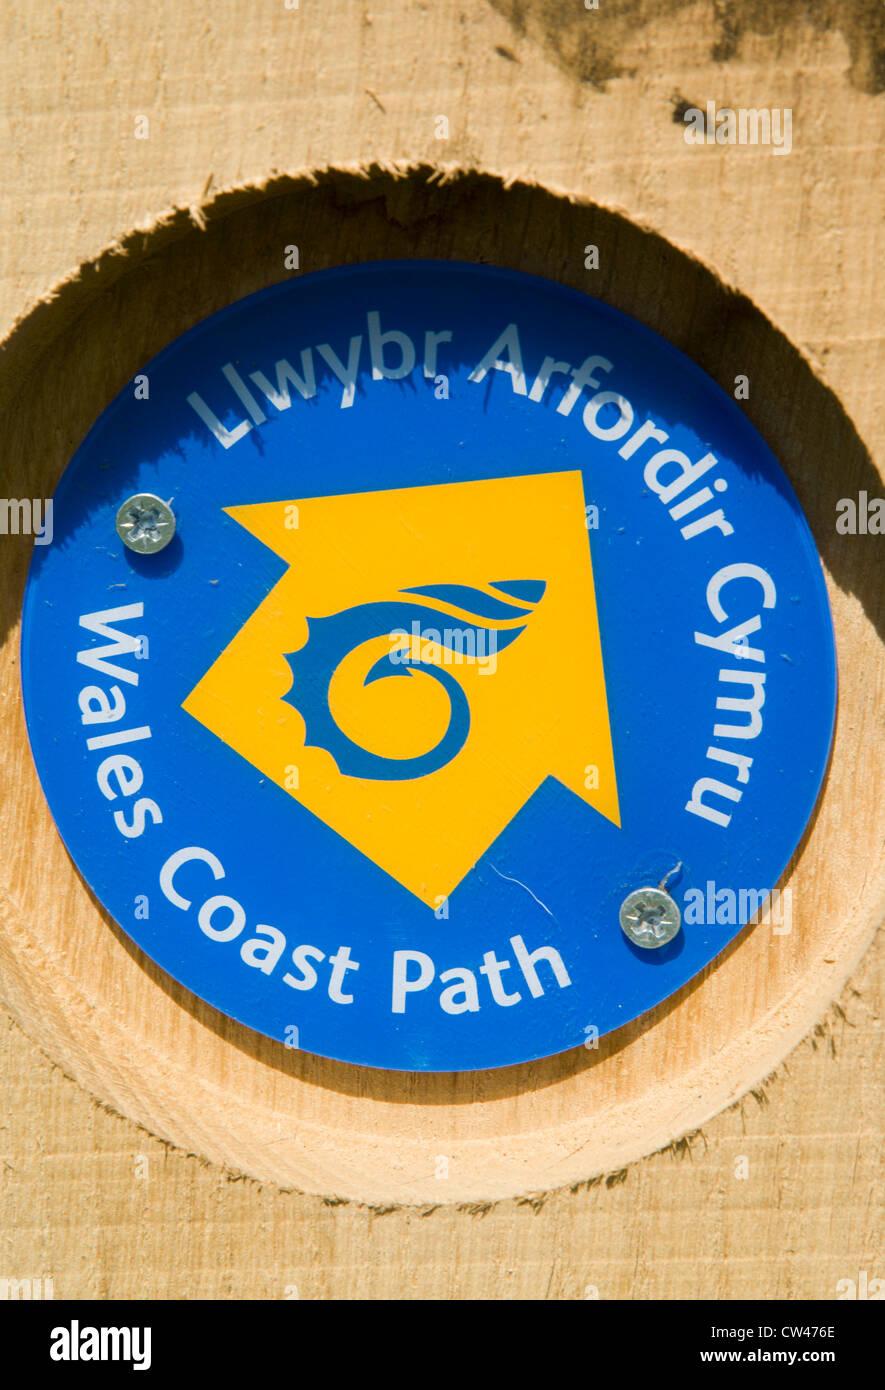 wales coastal path sign, llantwit major, glamorgan heritage coast, vale of glamorgan, wales. - Stock Image